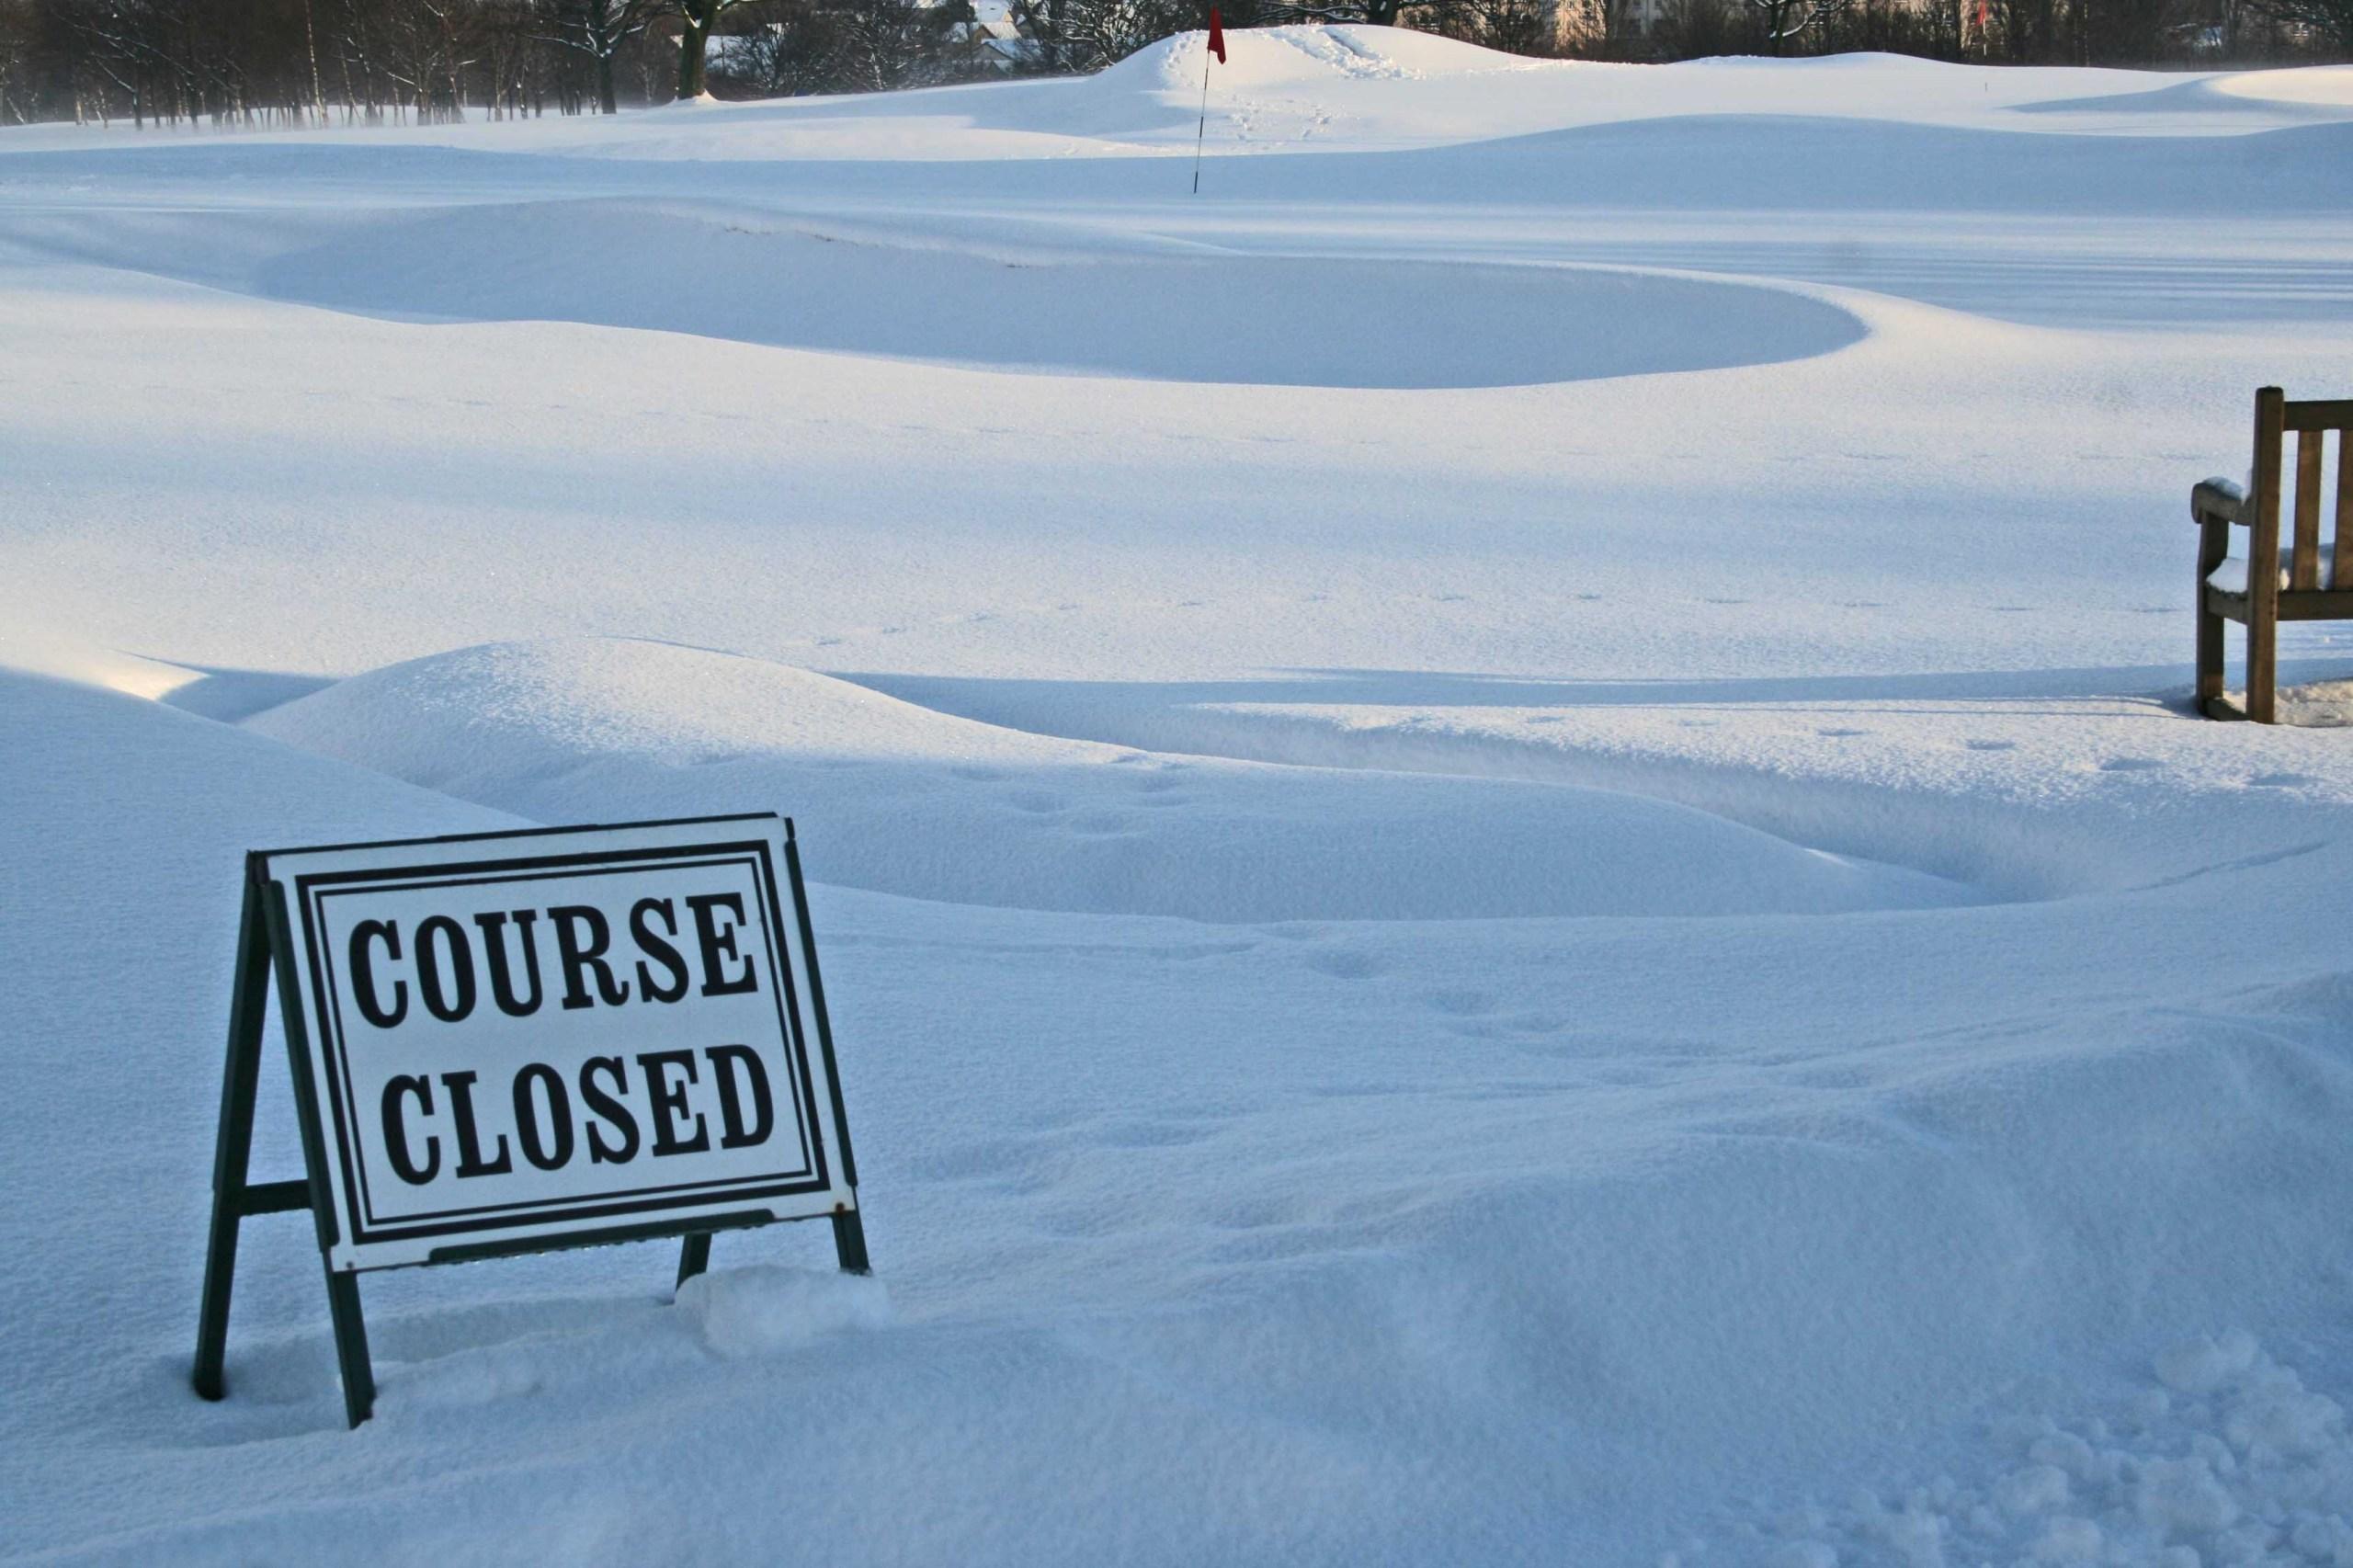 Course-closed_r